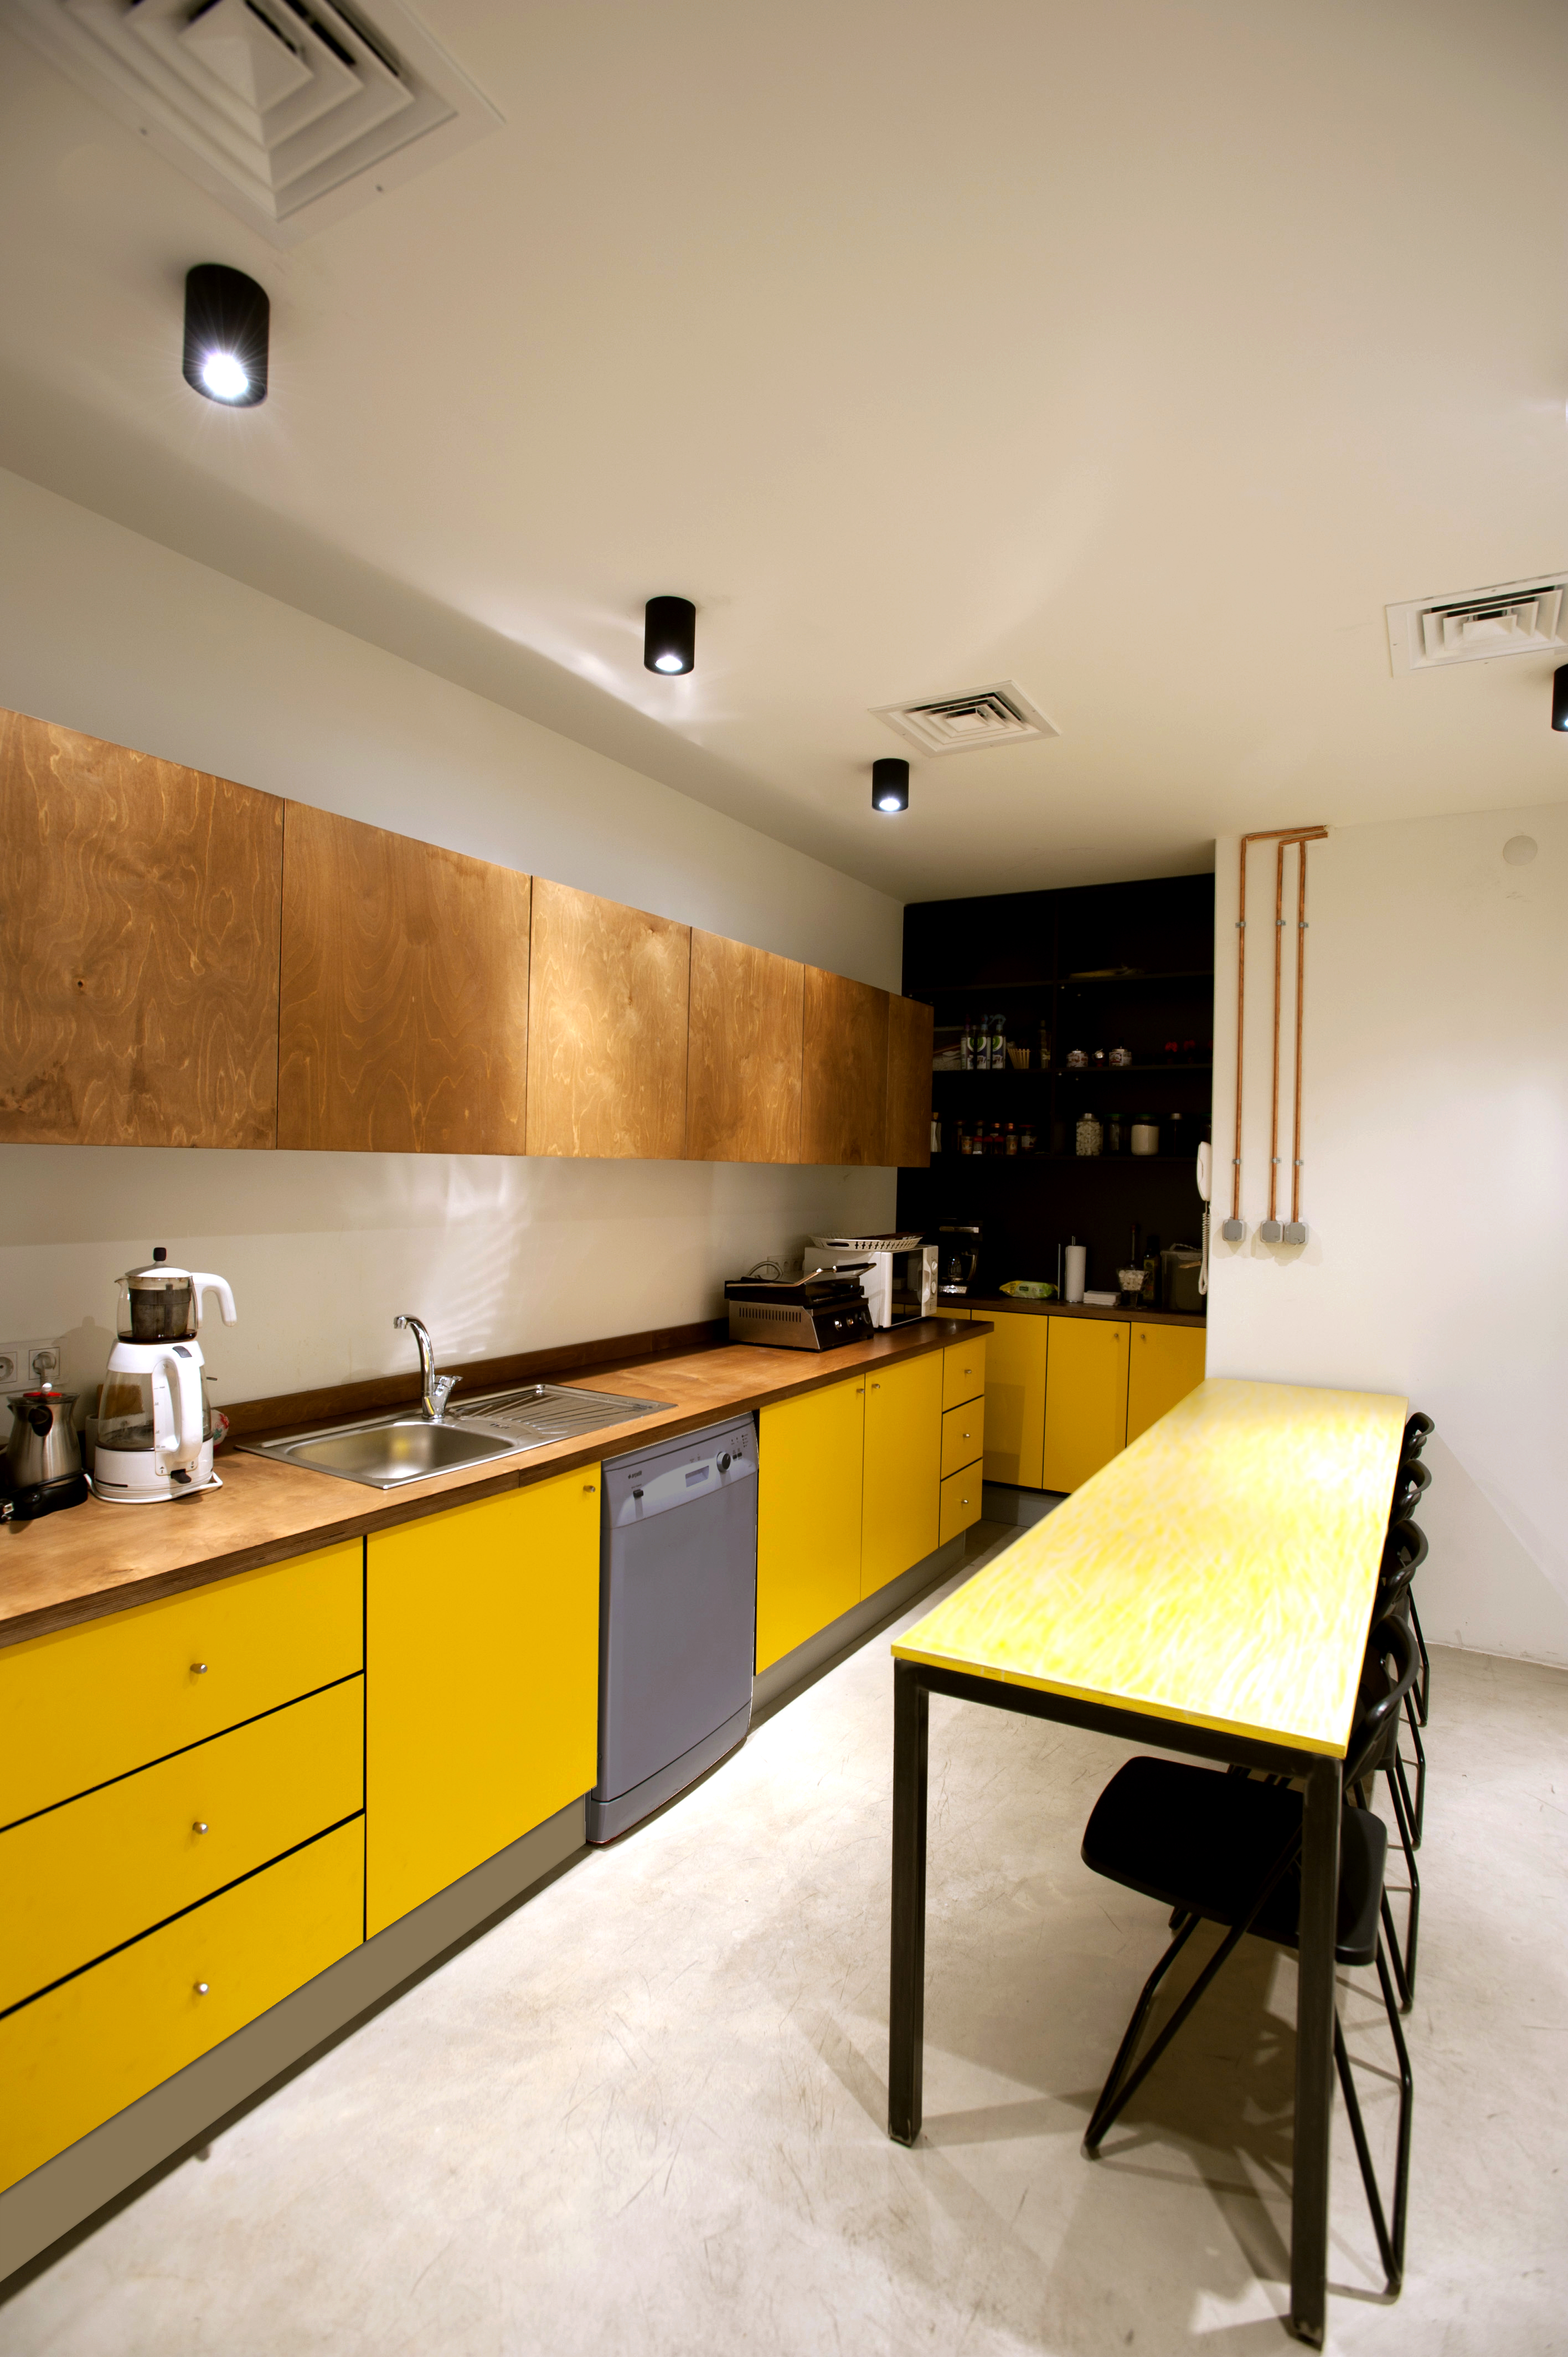 DILA+GOKALP+ARCHITECTS-MOBILIKE+7529